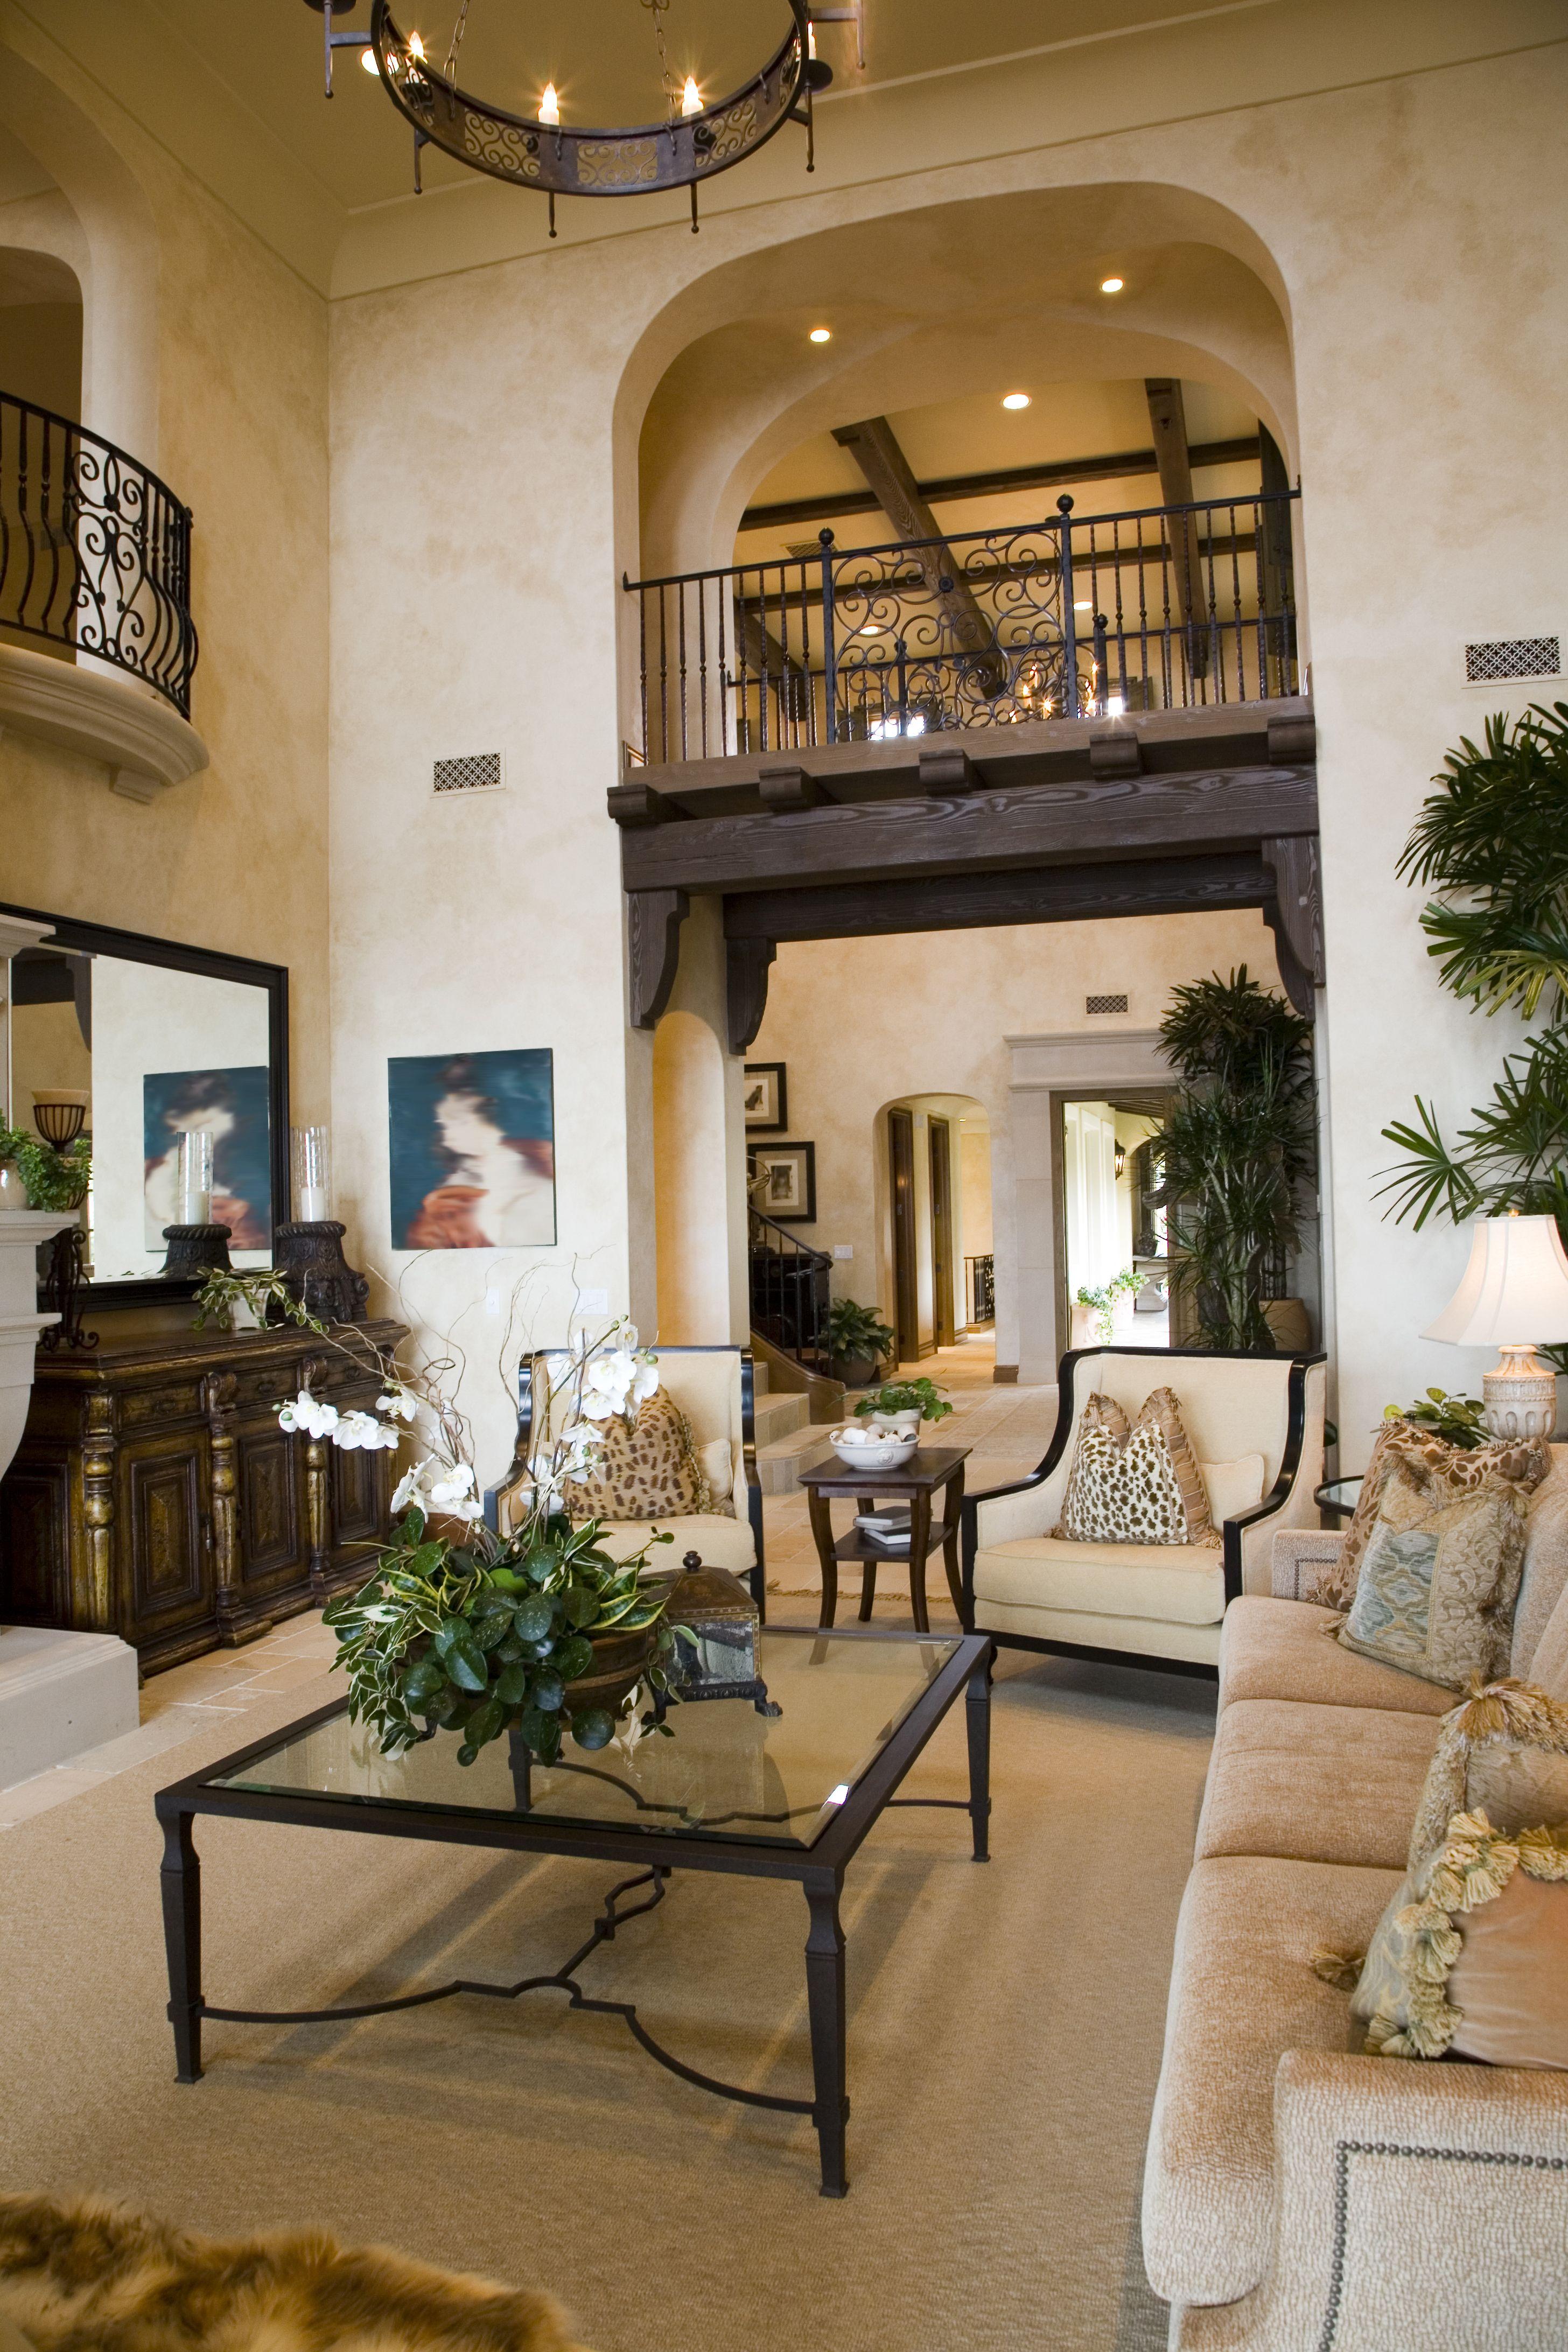 101 Beautiful Formal Living Room Ideas Photos Tuscan Living Rooms Mediterranean Living Rooms Mediterranean Homes